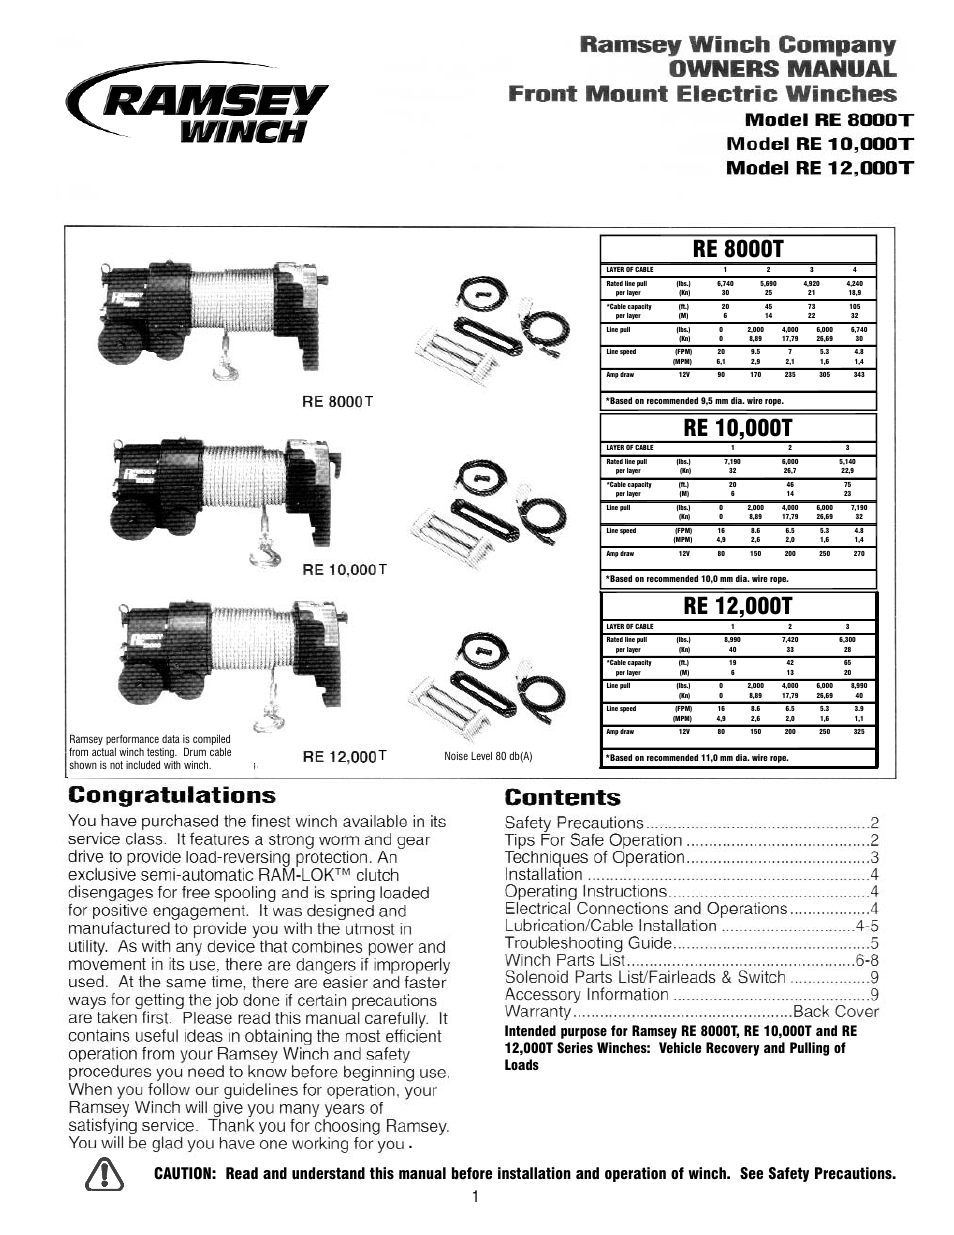 hickey sidewinder winch wiring diagram